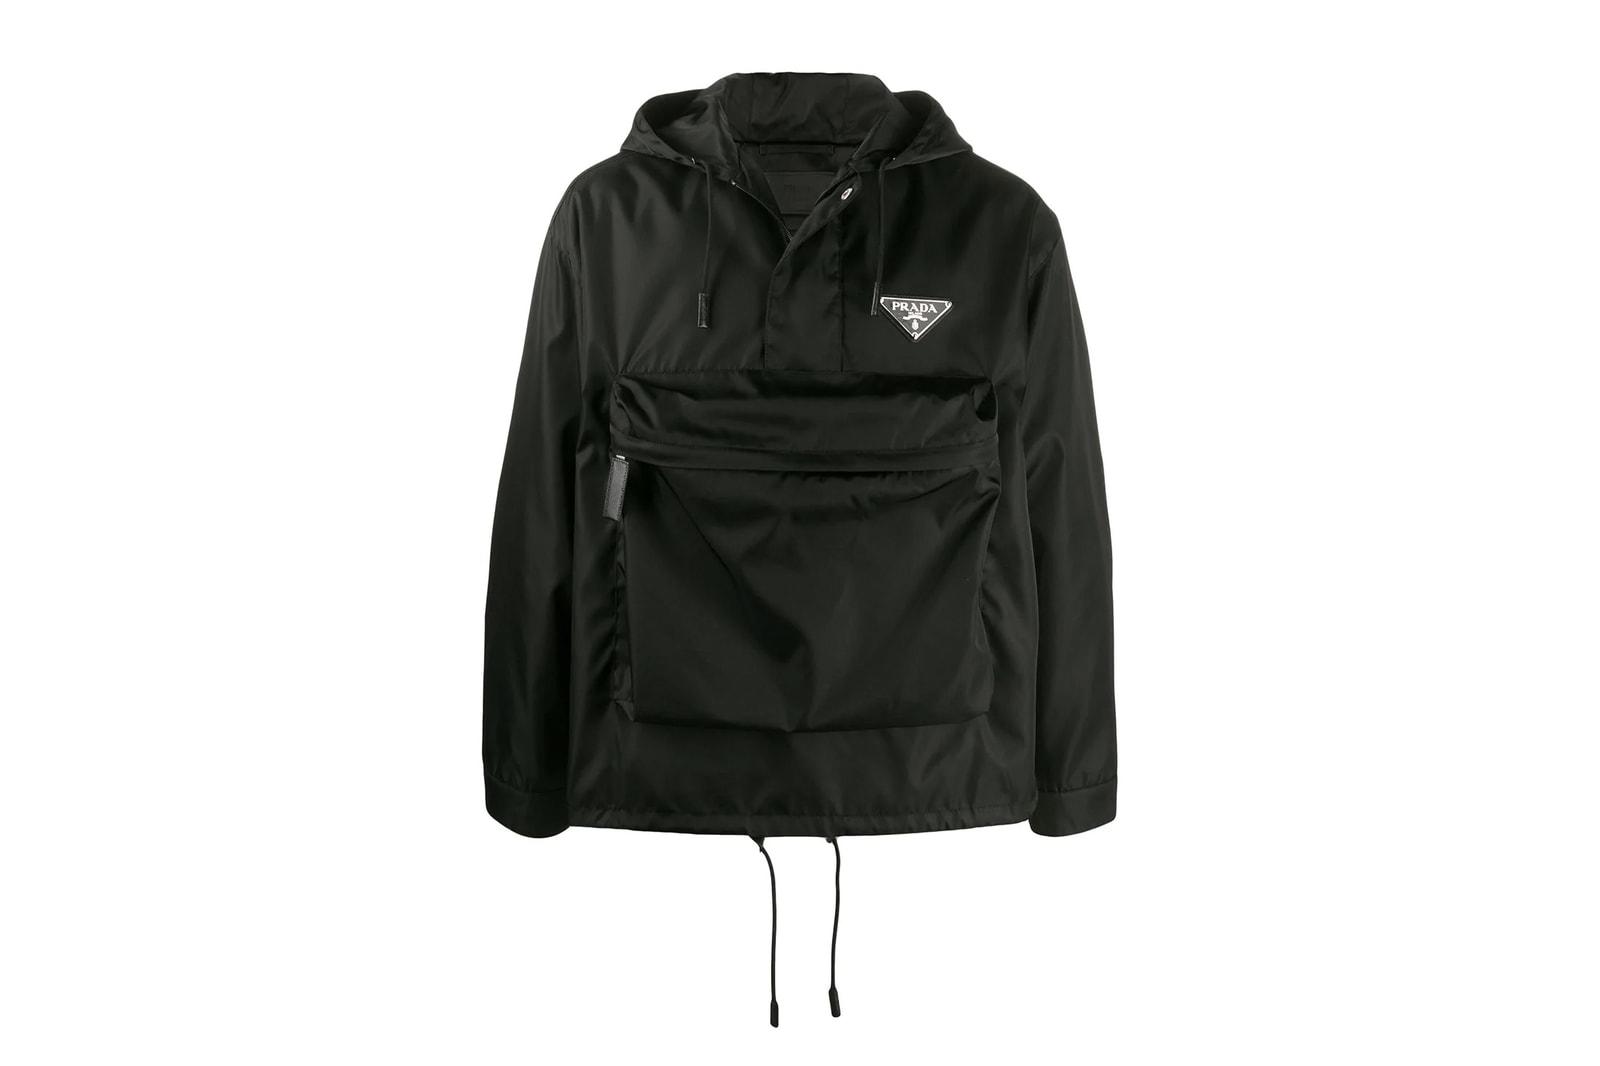 Best Coat & Jacket Trends Fall/Winter 2020 Brands Puffer Trench Coat Leather Biker Jacket Acne Studios GANNI Moncler BUrberry Alexander Wang Loewe Fendi PRada Bottega Veneta